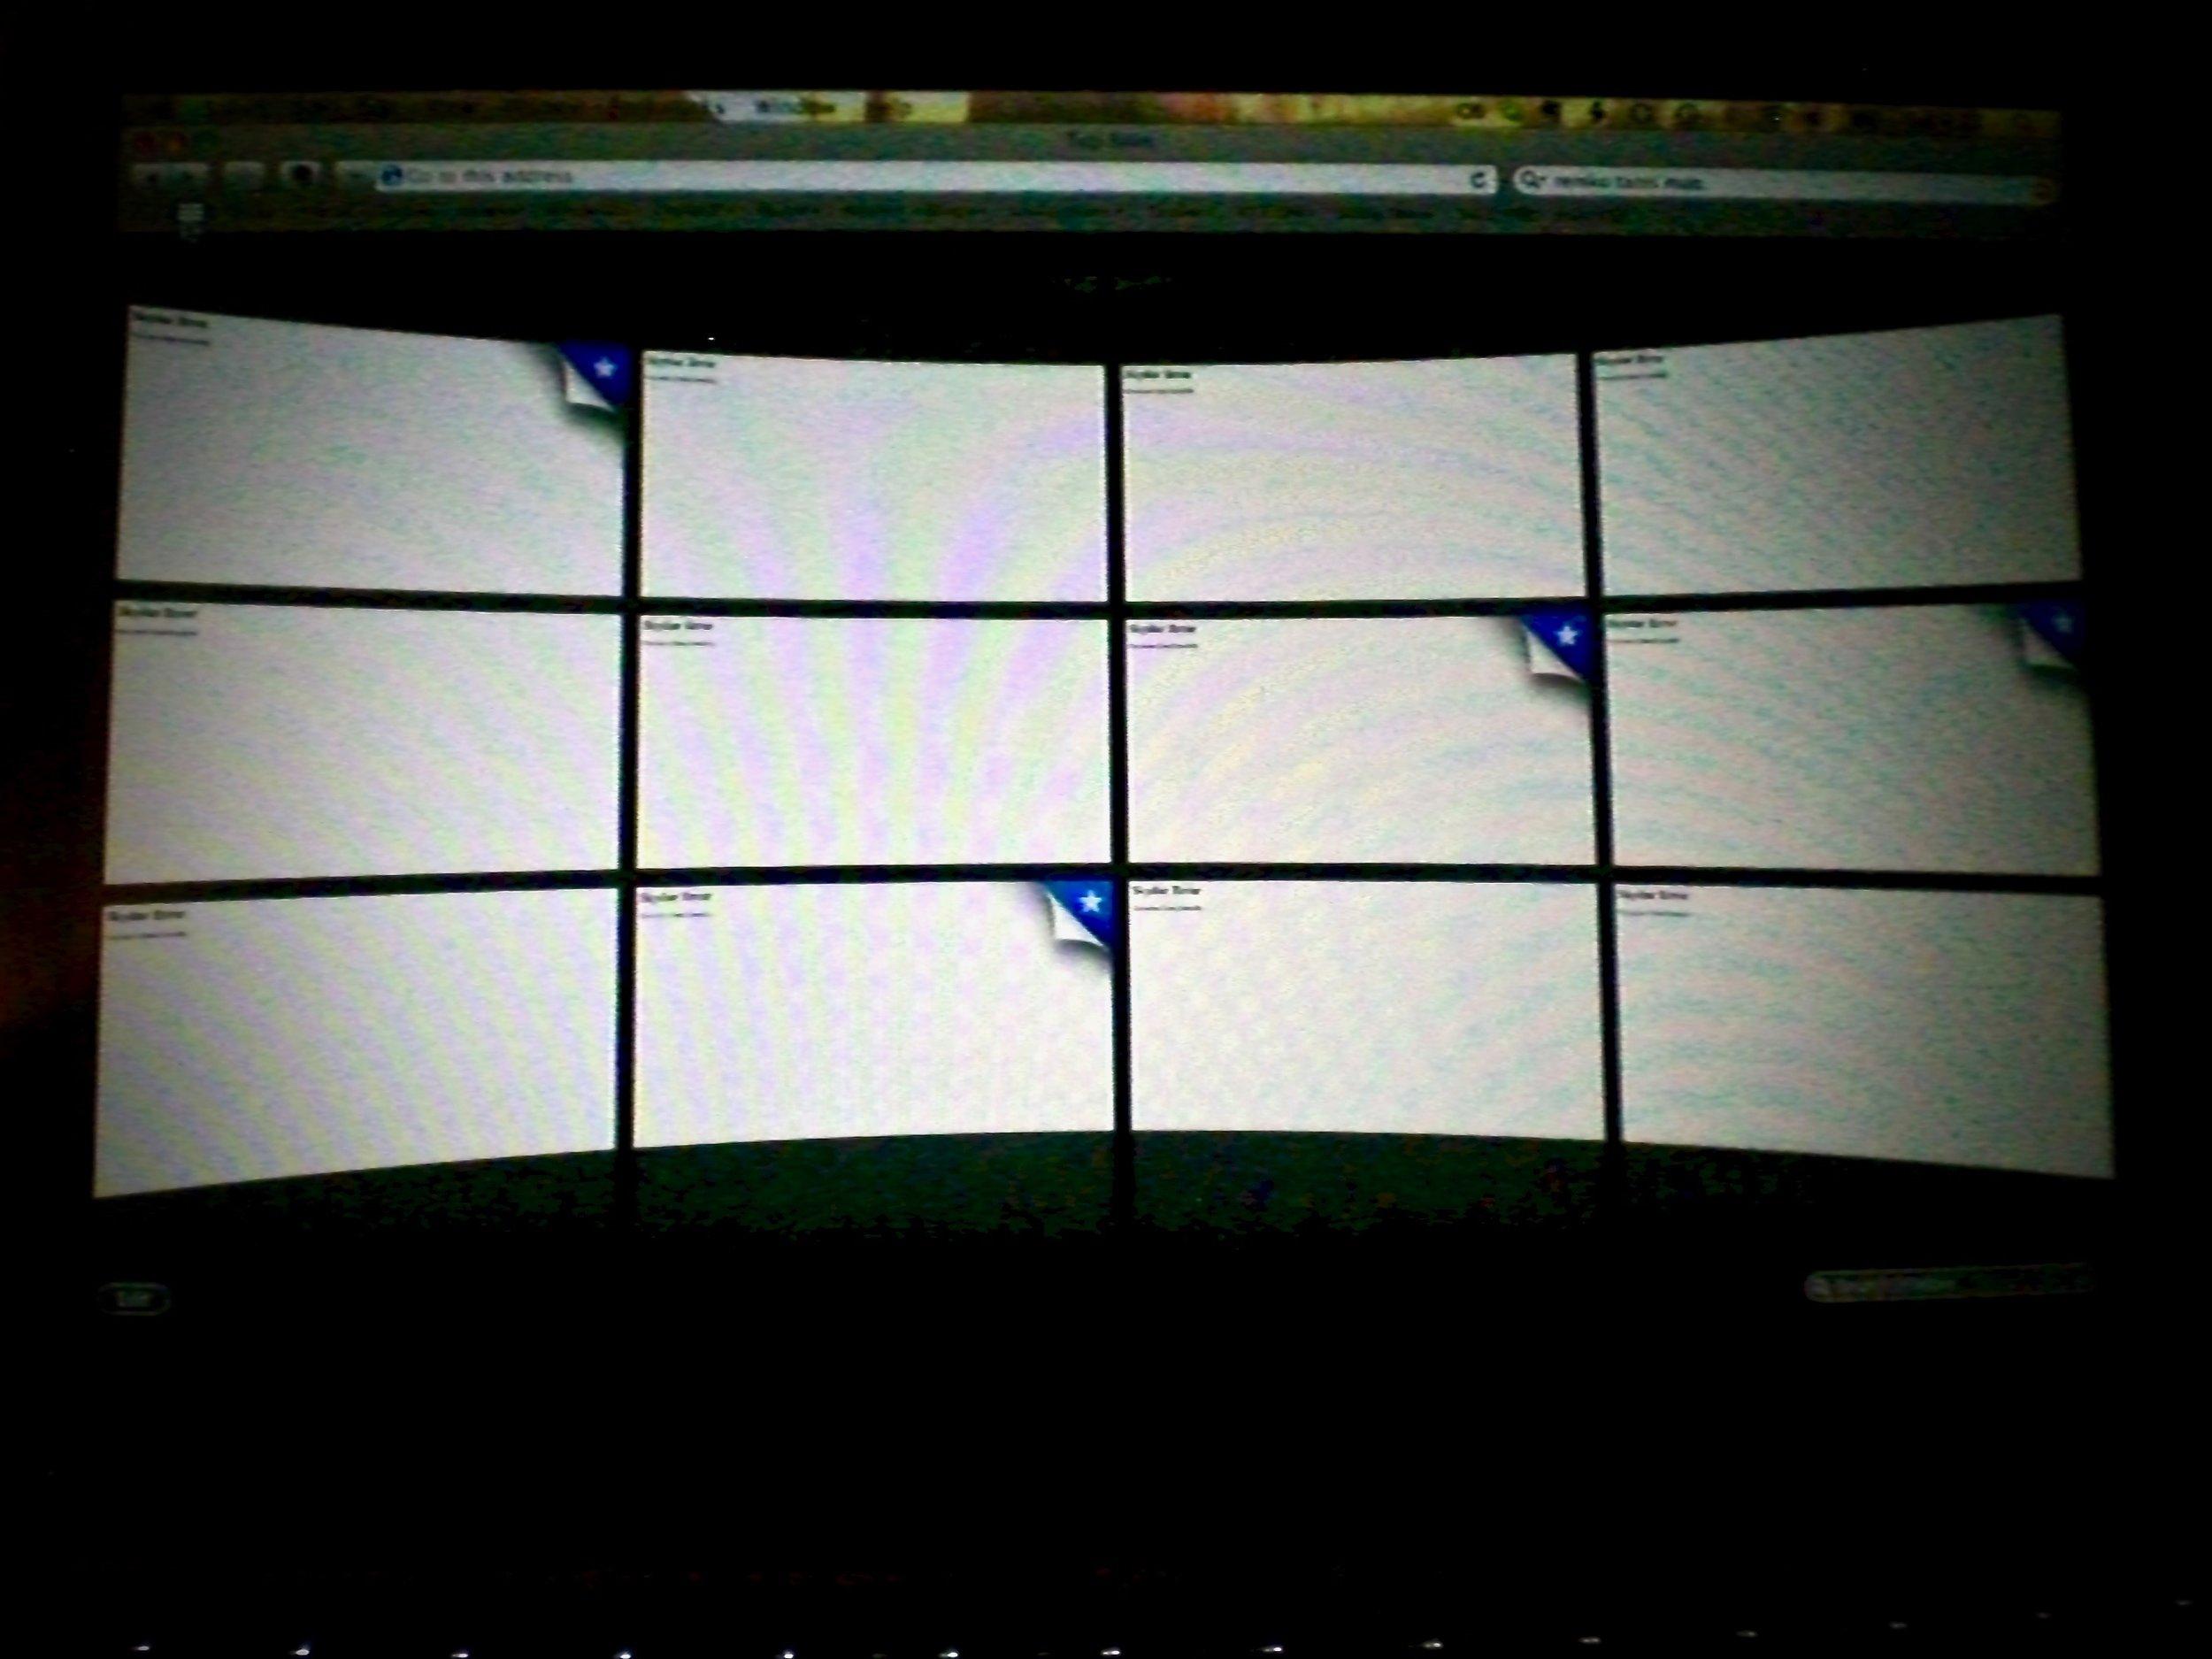 Internet censorship in China: blocked websites return white screens. (C) Remko Tanis